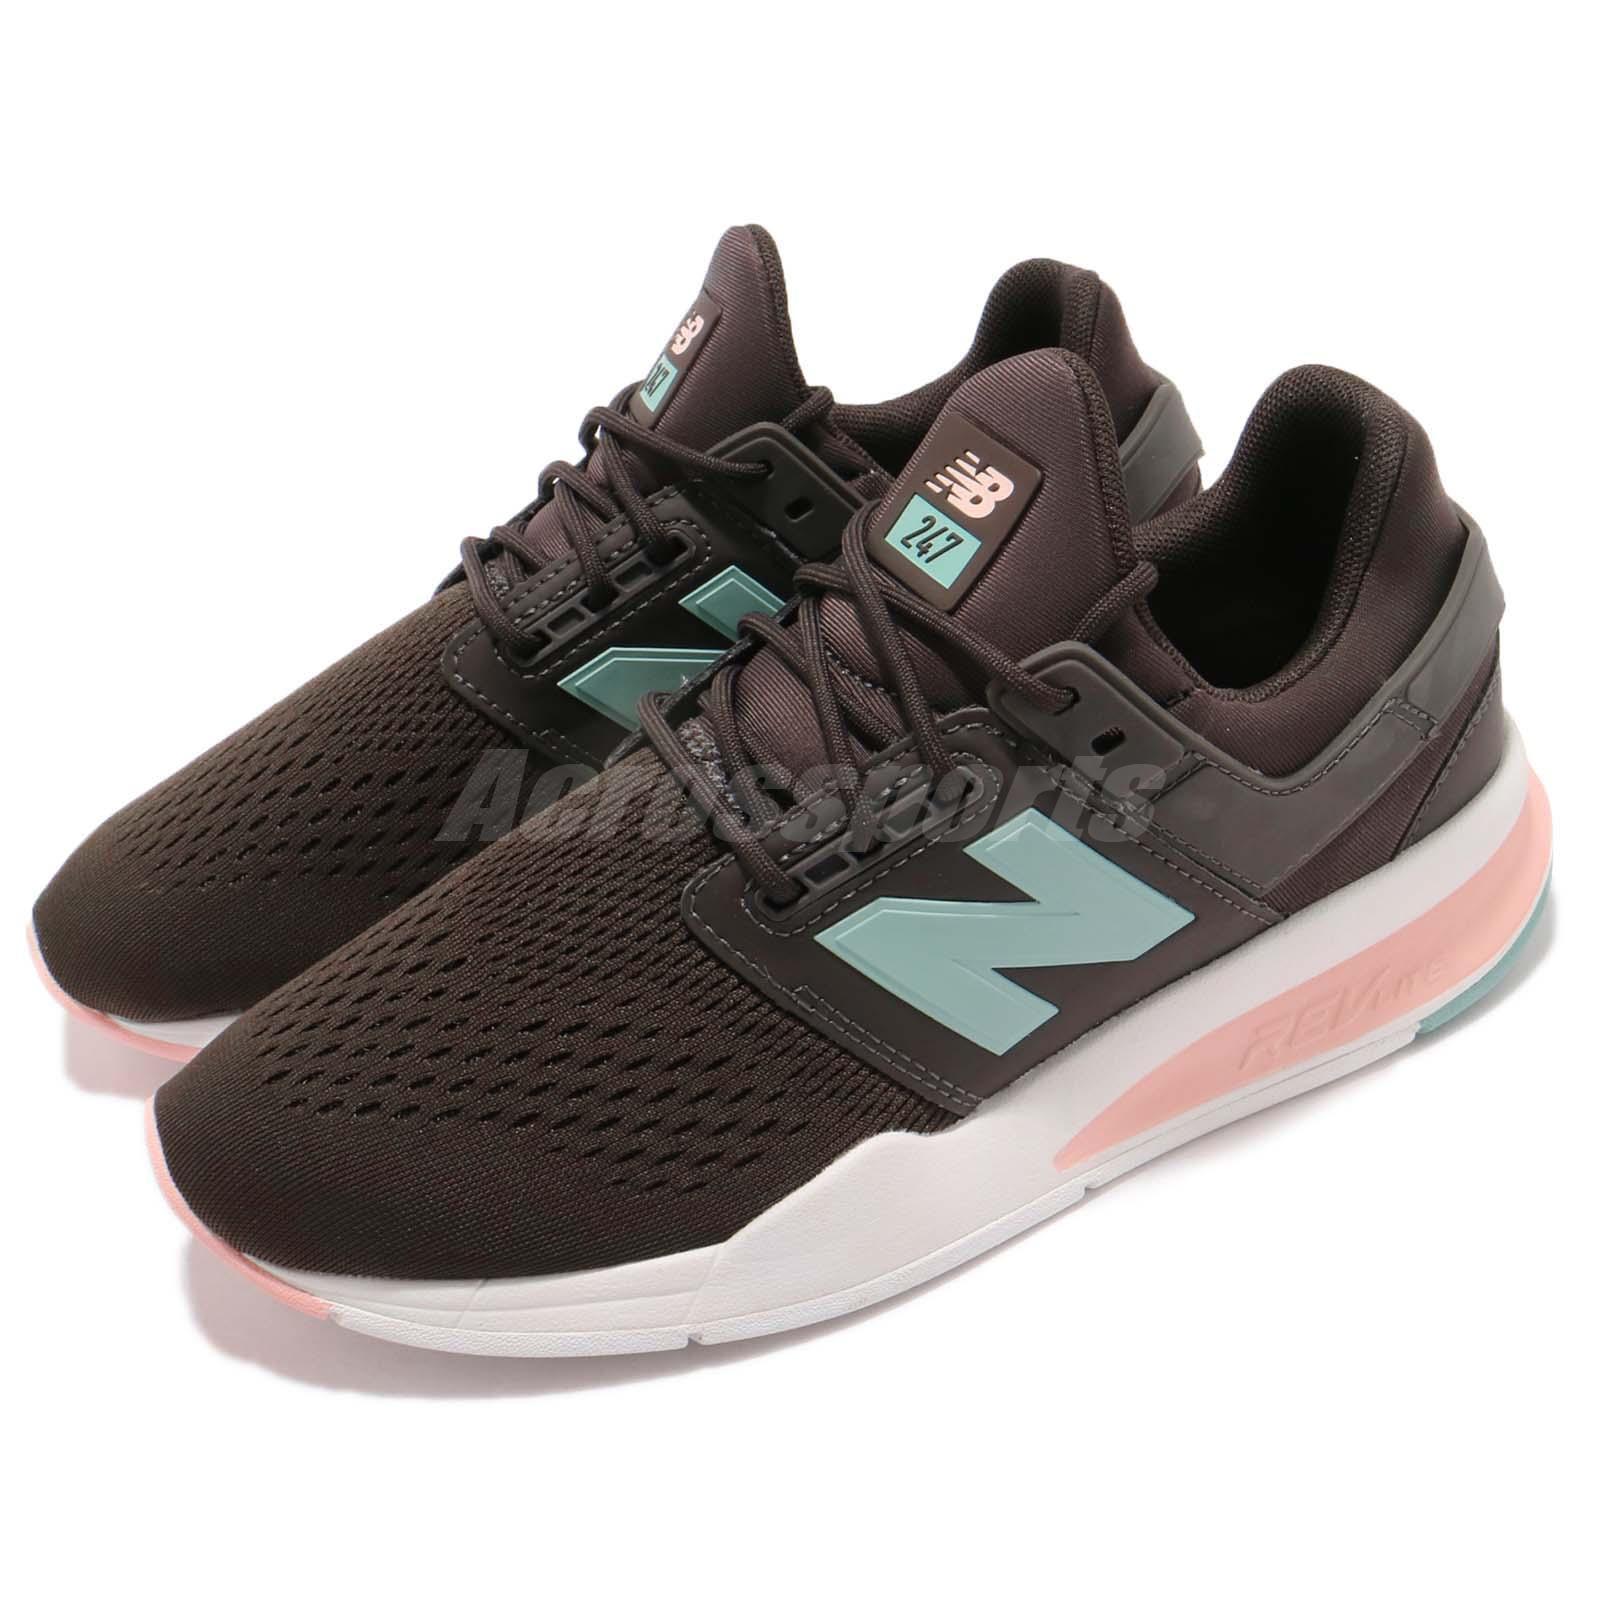 New Balance WS247FD B 247 Brown blueee Pink Women Lifestyle Running shoes WS247FDB